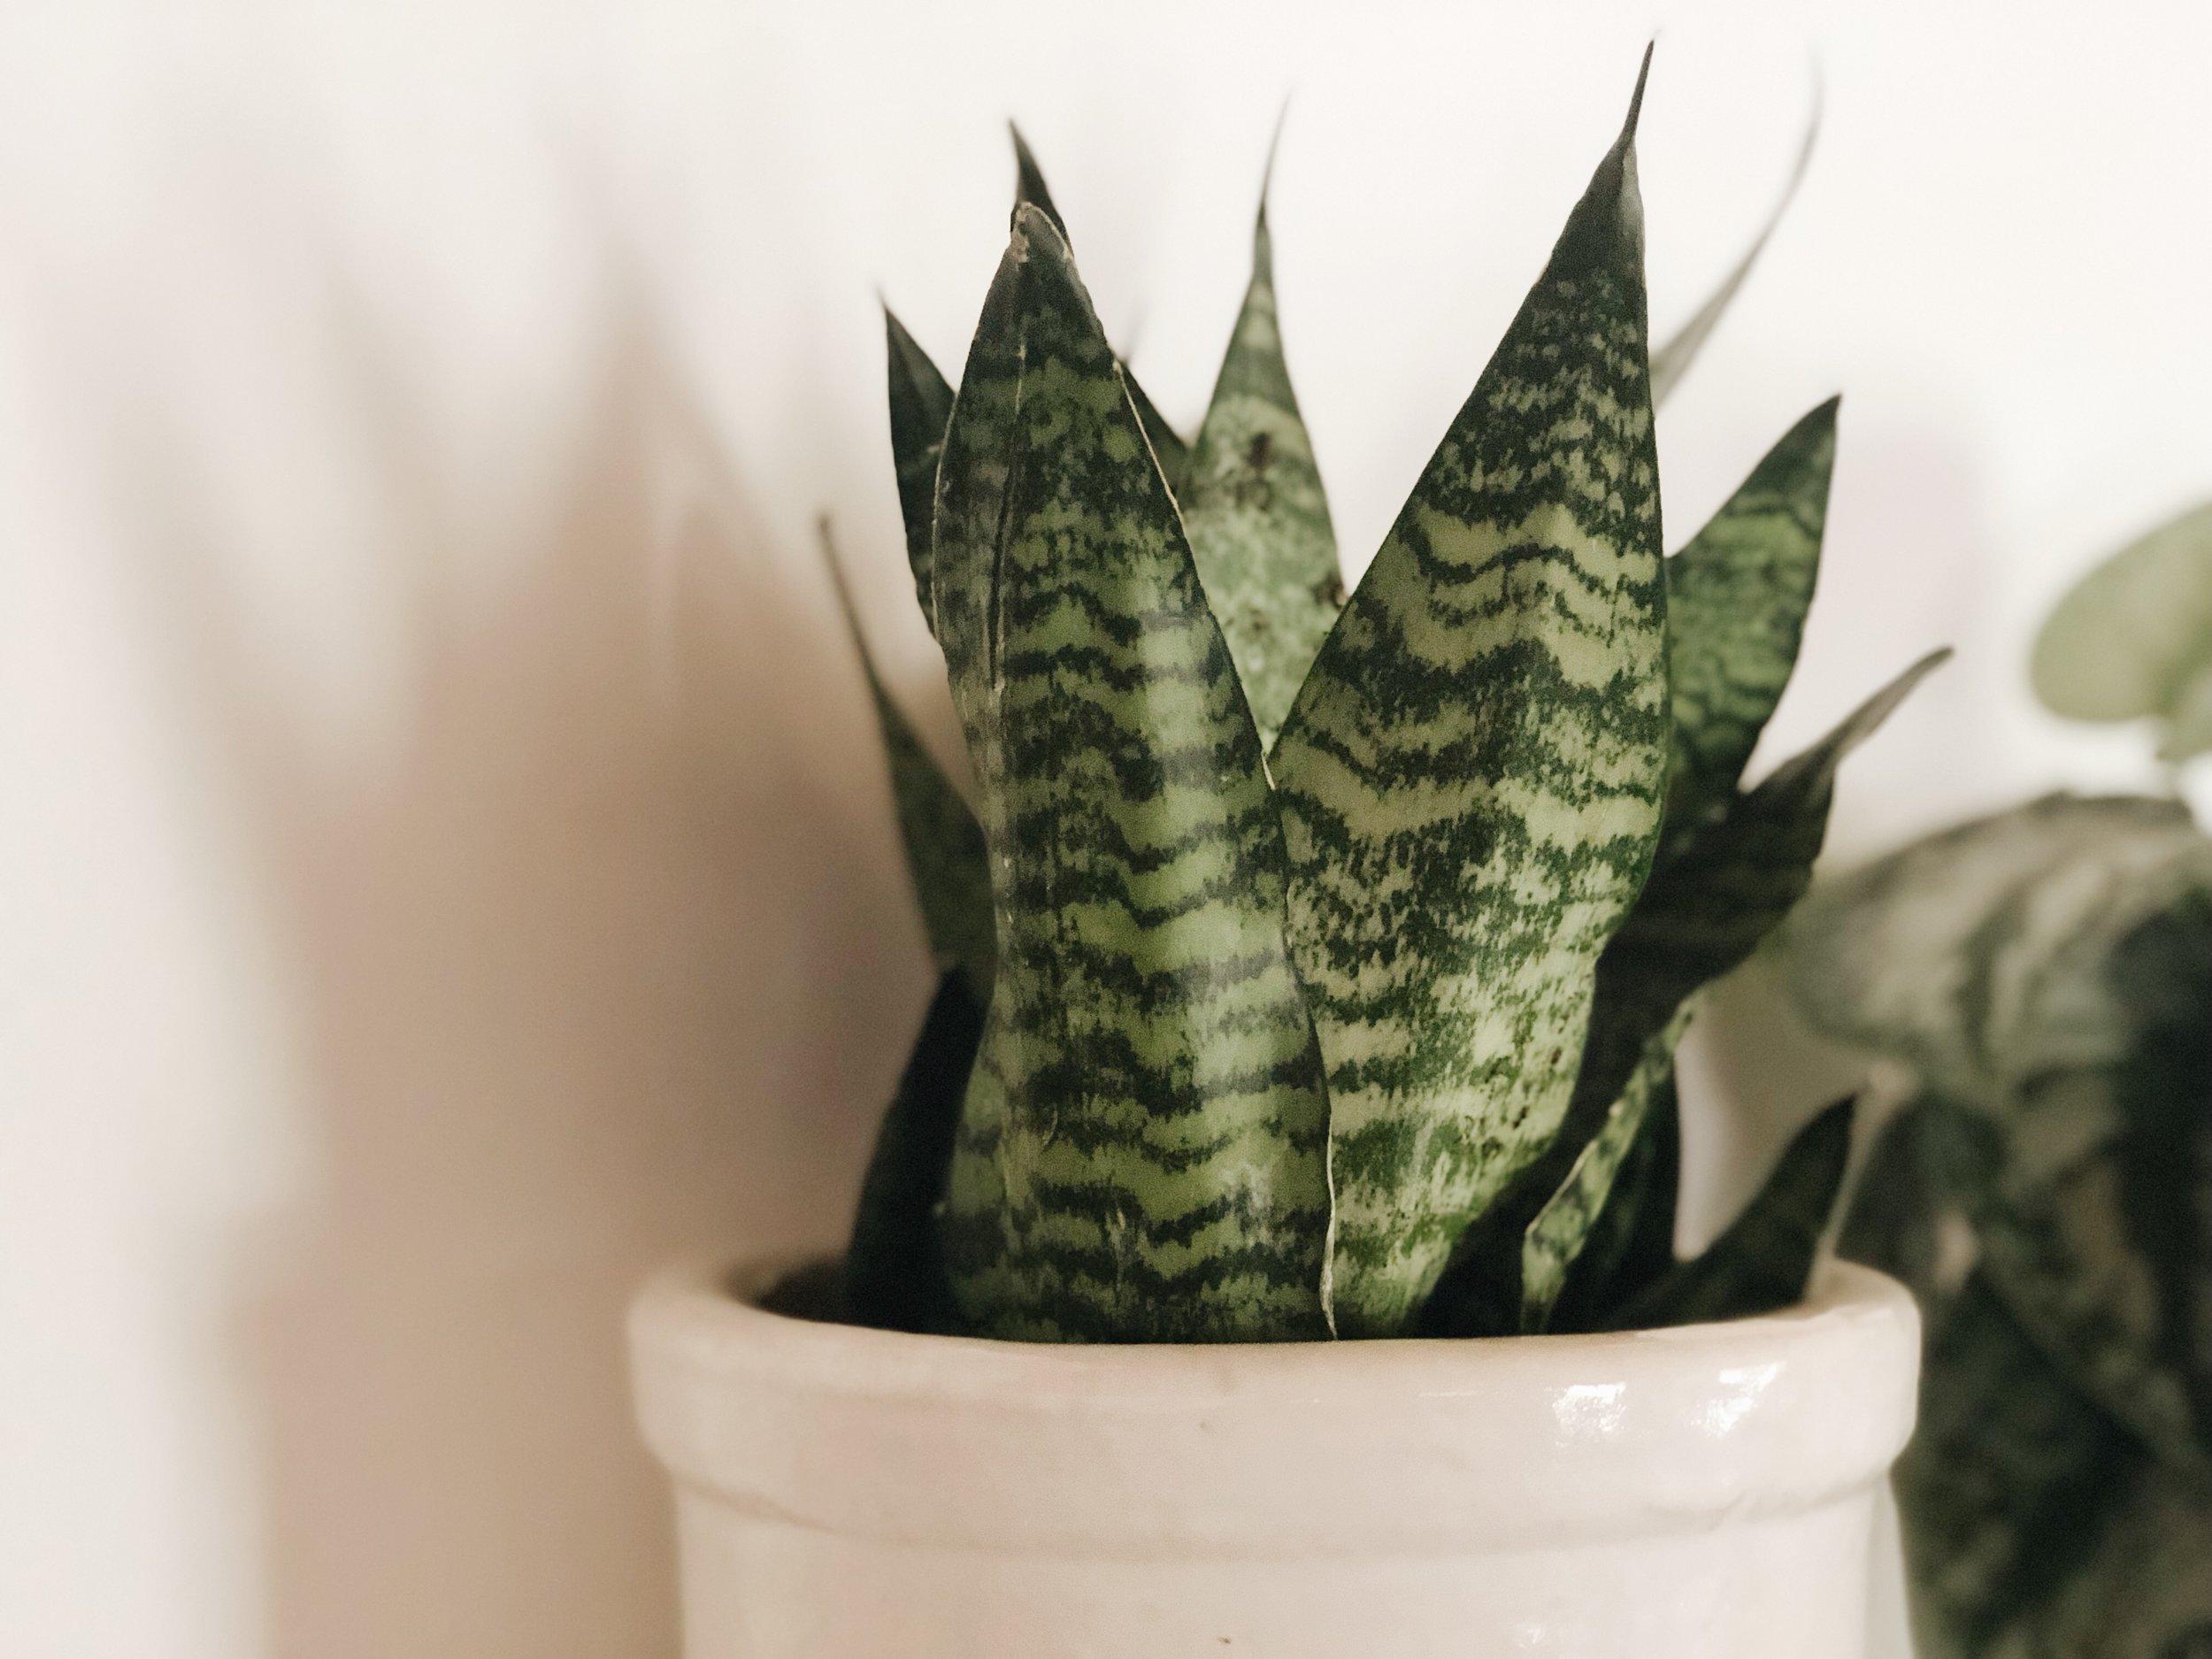 green snake plant in white pot against white wall